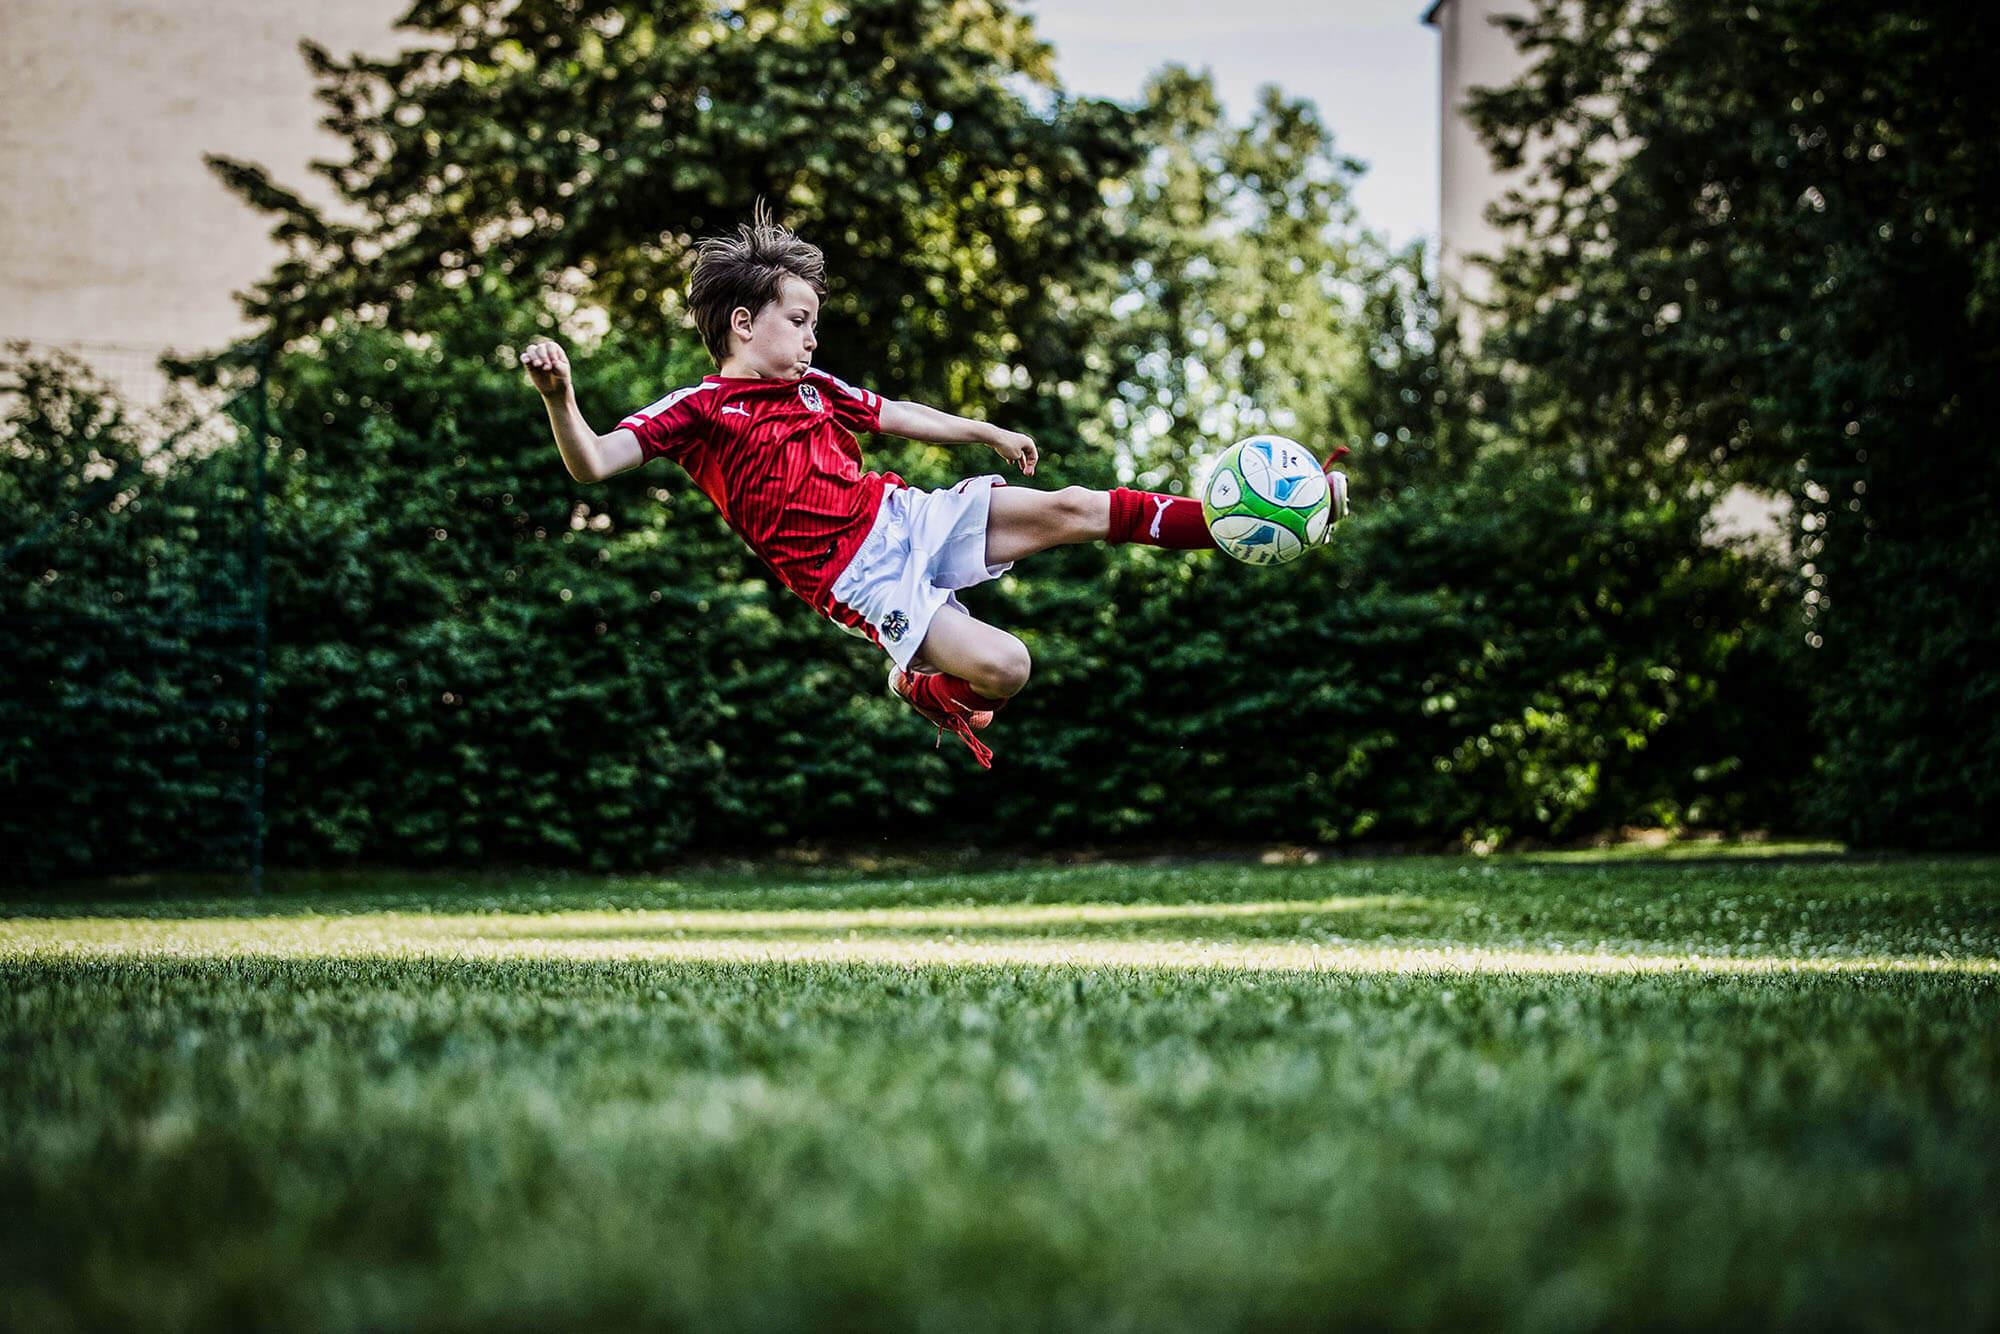 soccer football scissors kick action sports photography sportfotografie flap photography fotograf philipp greindl photographer linz austria